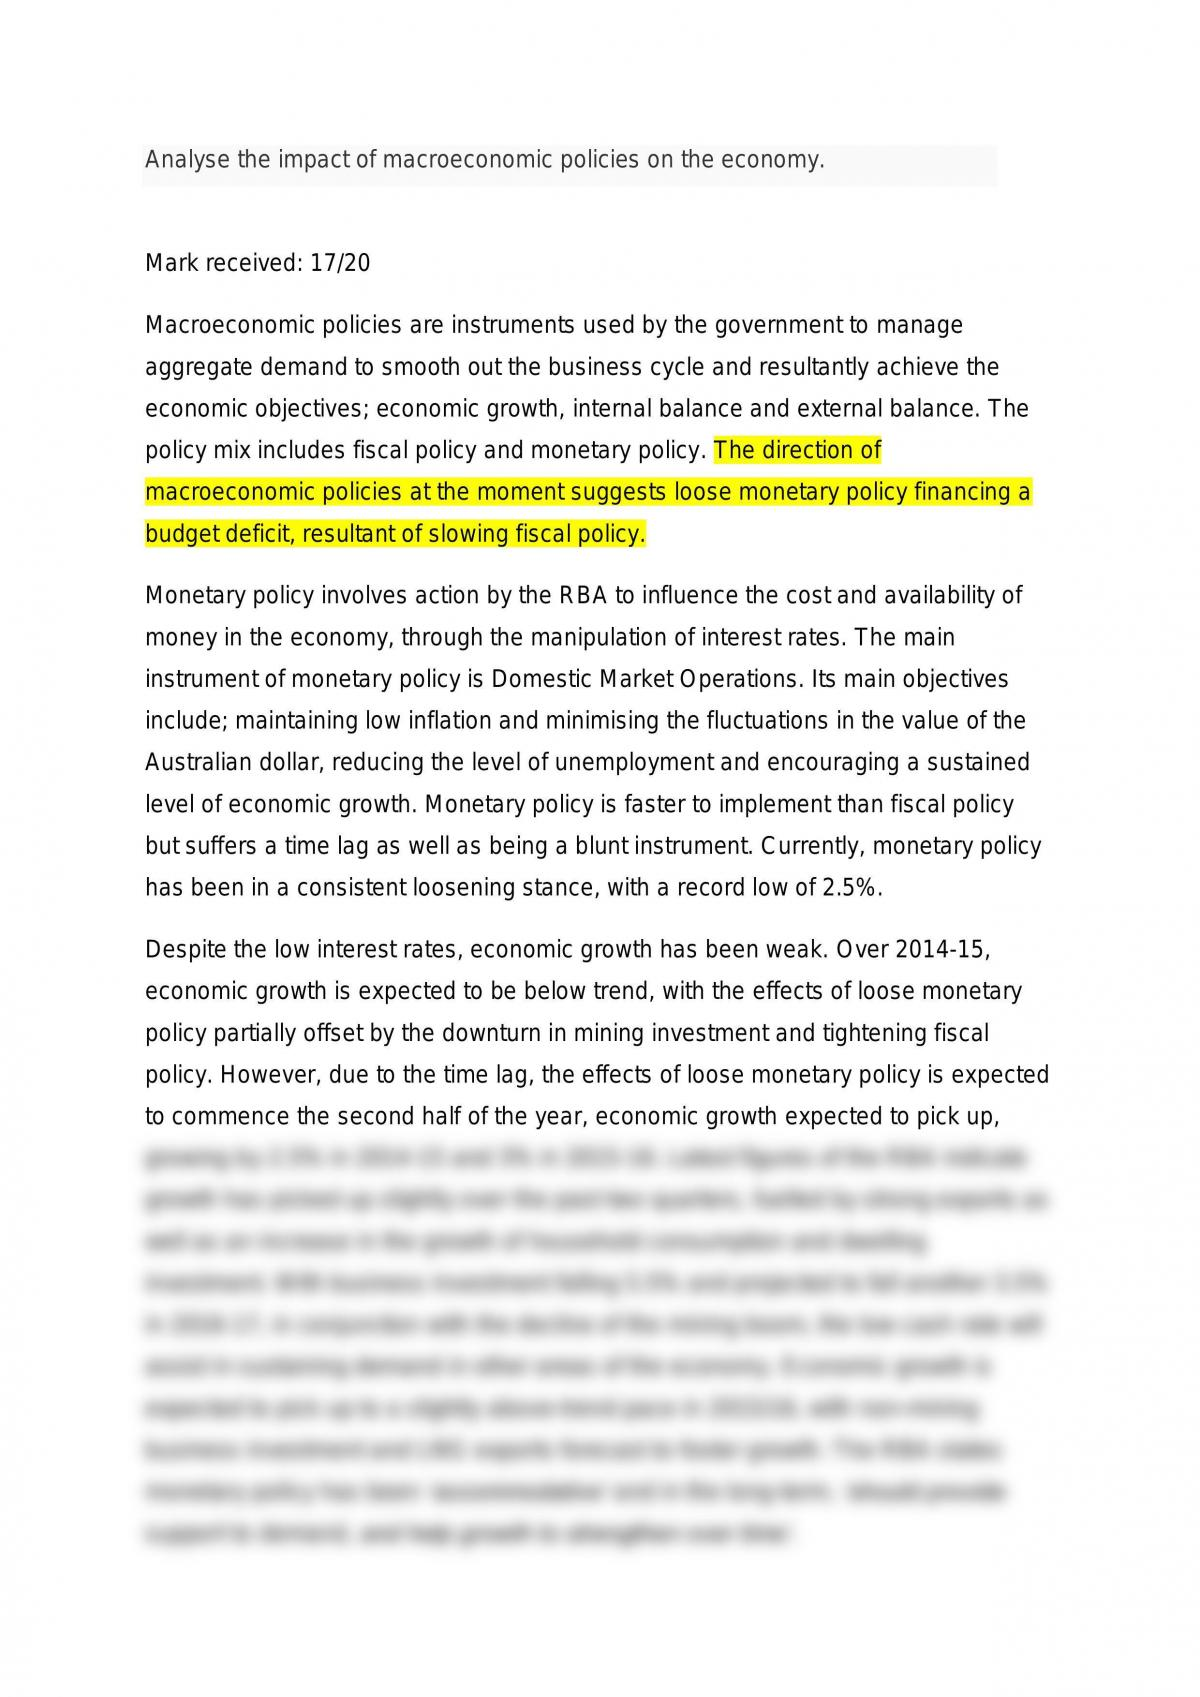 2014 HSC Macroeconomic Analysis Essay  - Page 1